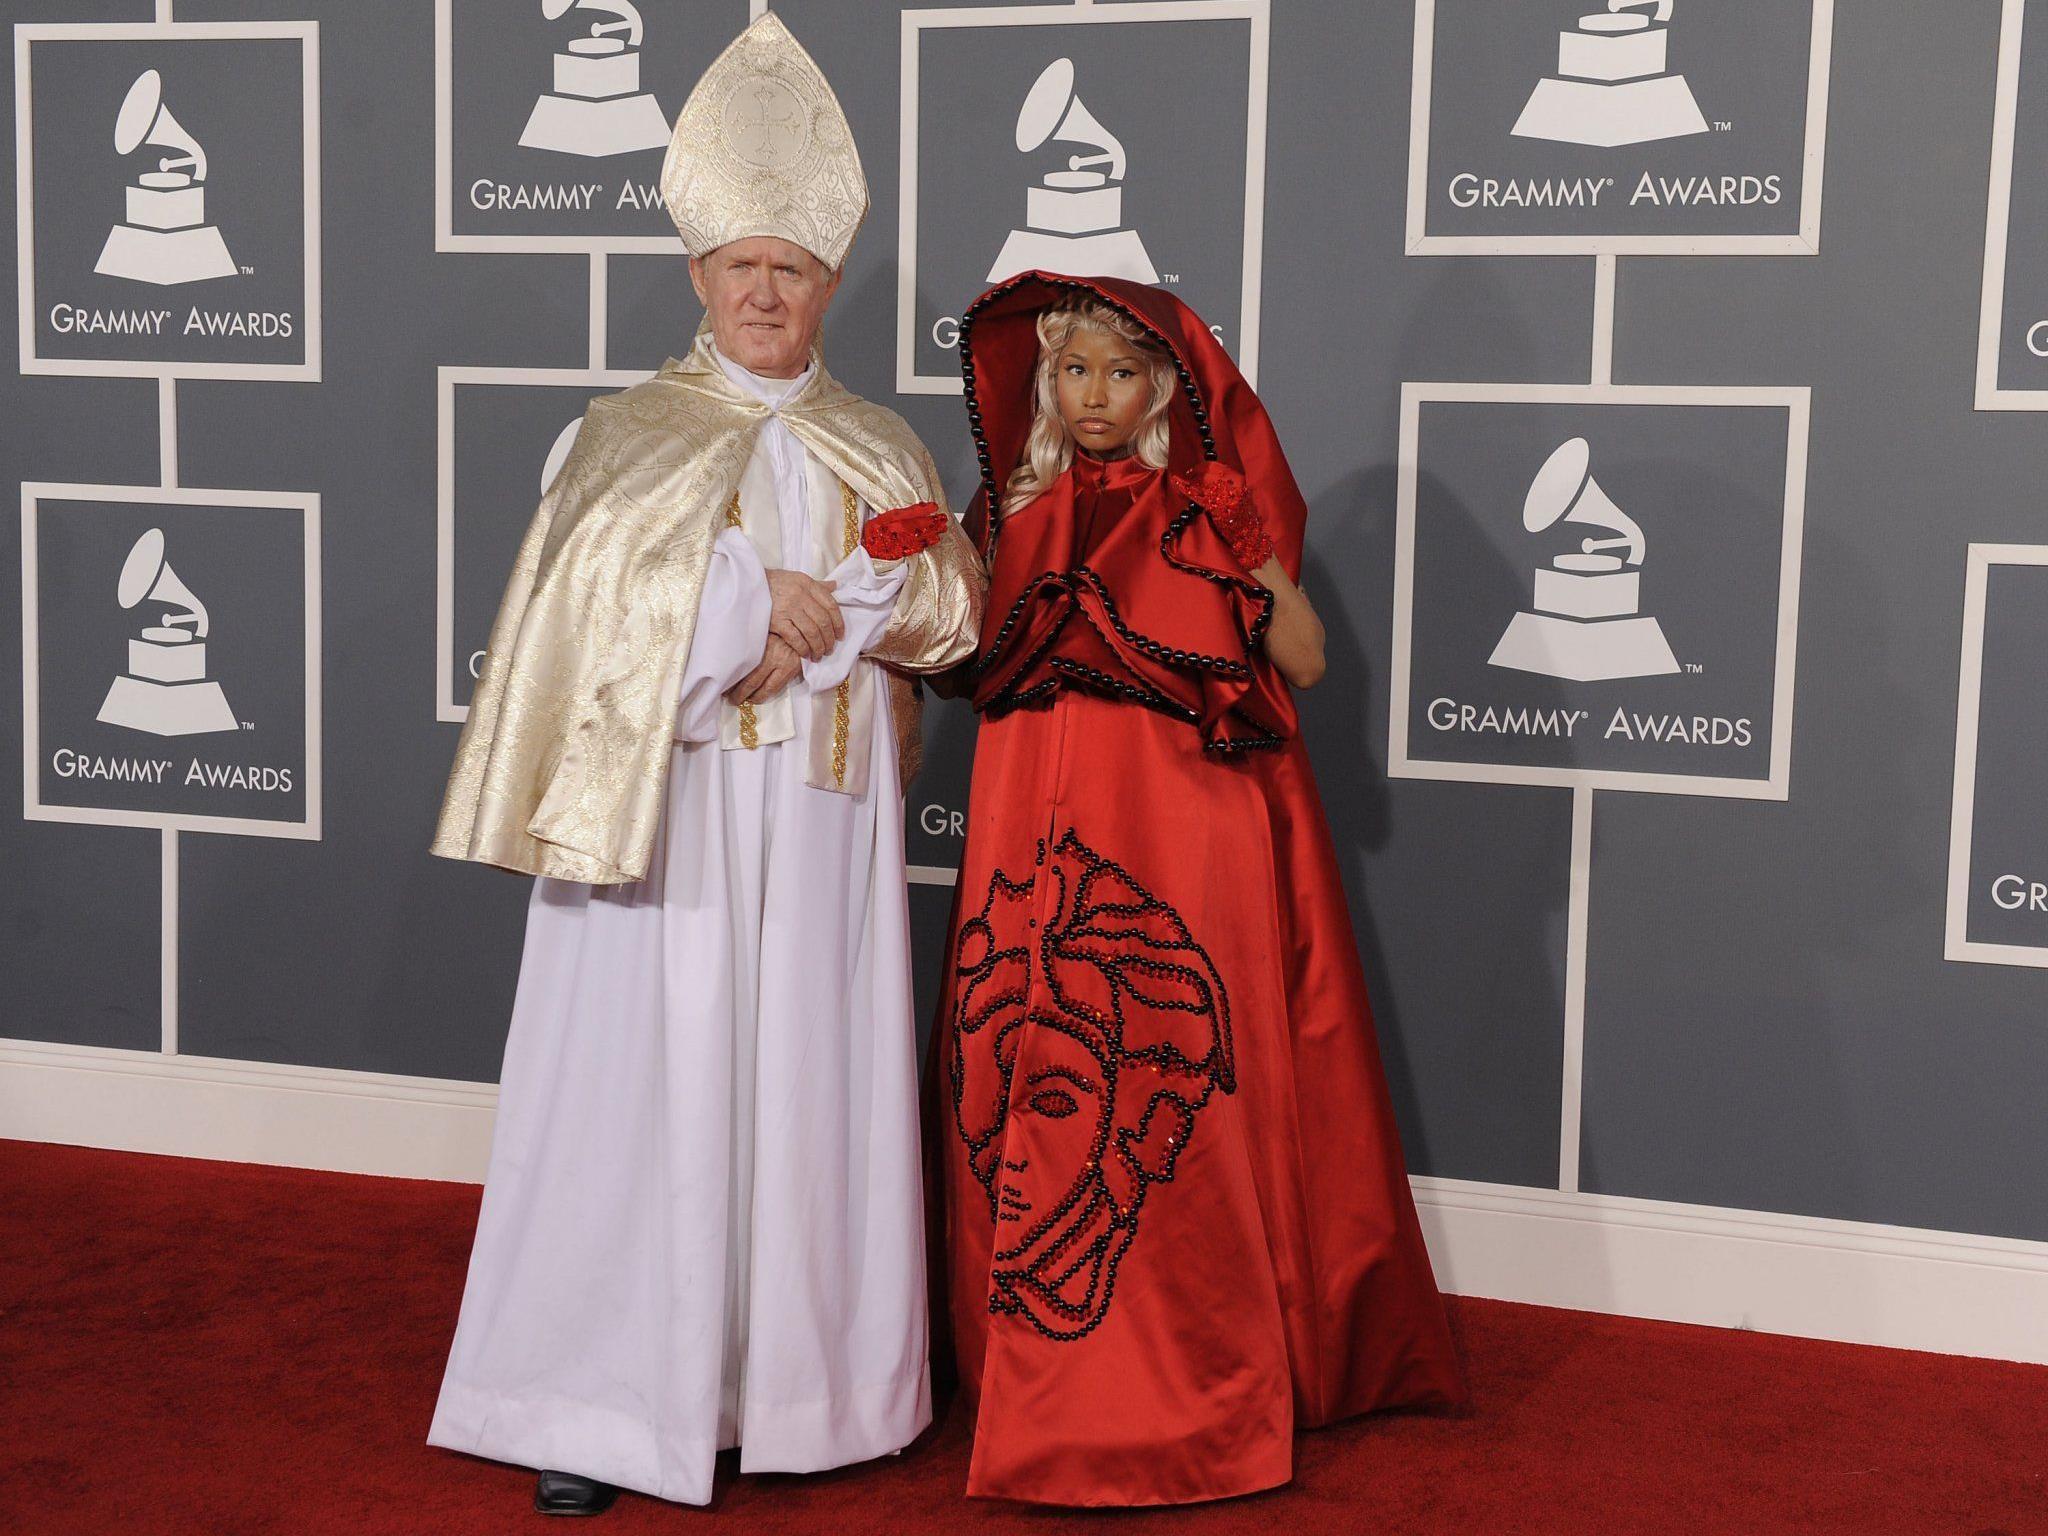 Nicki MInajs Nonnen-Auftritt wird kontrovers diskutiert.